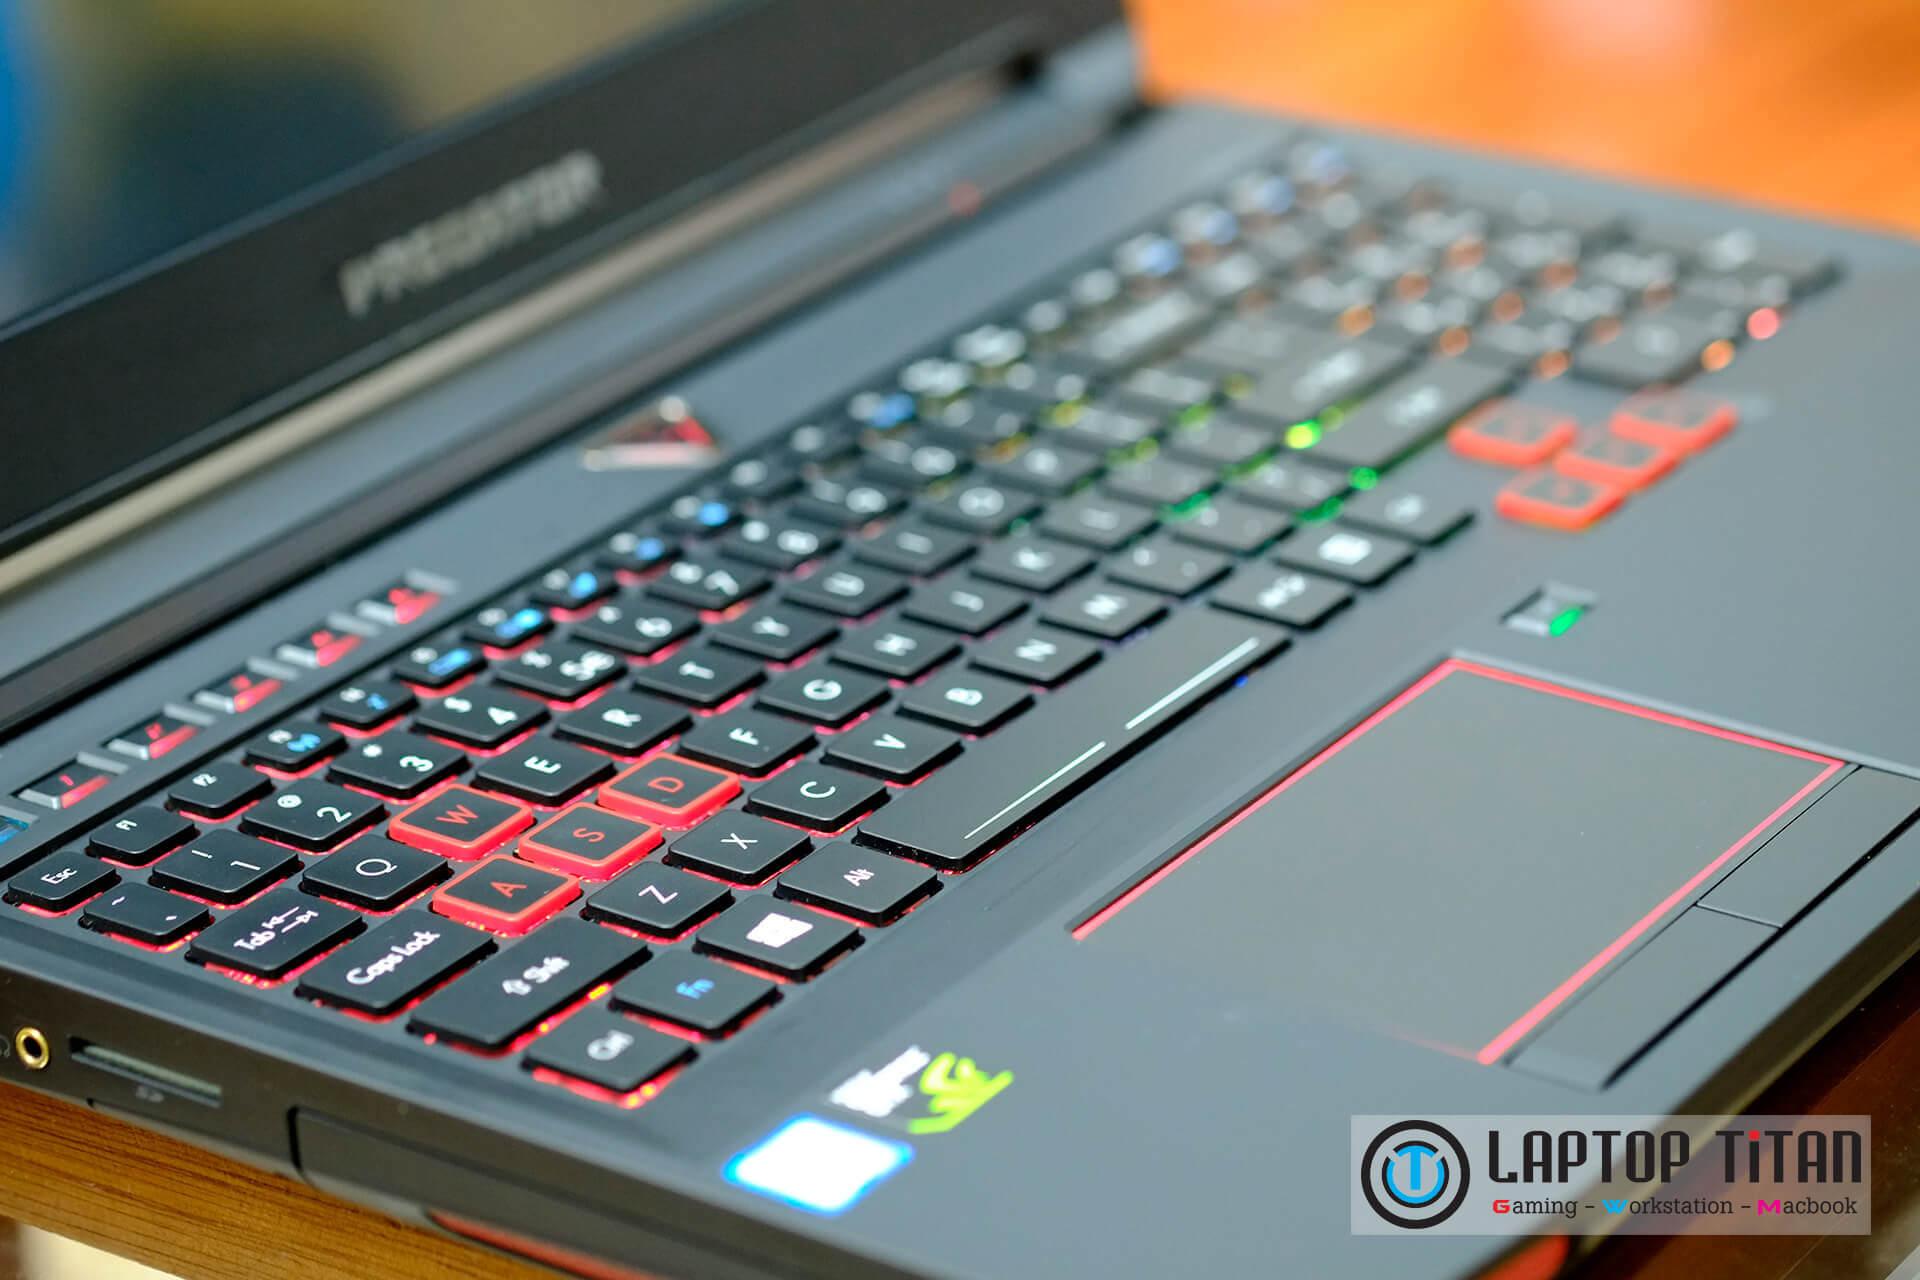 Acer-Predator-15-G9-593-4